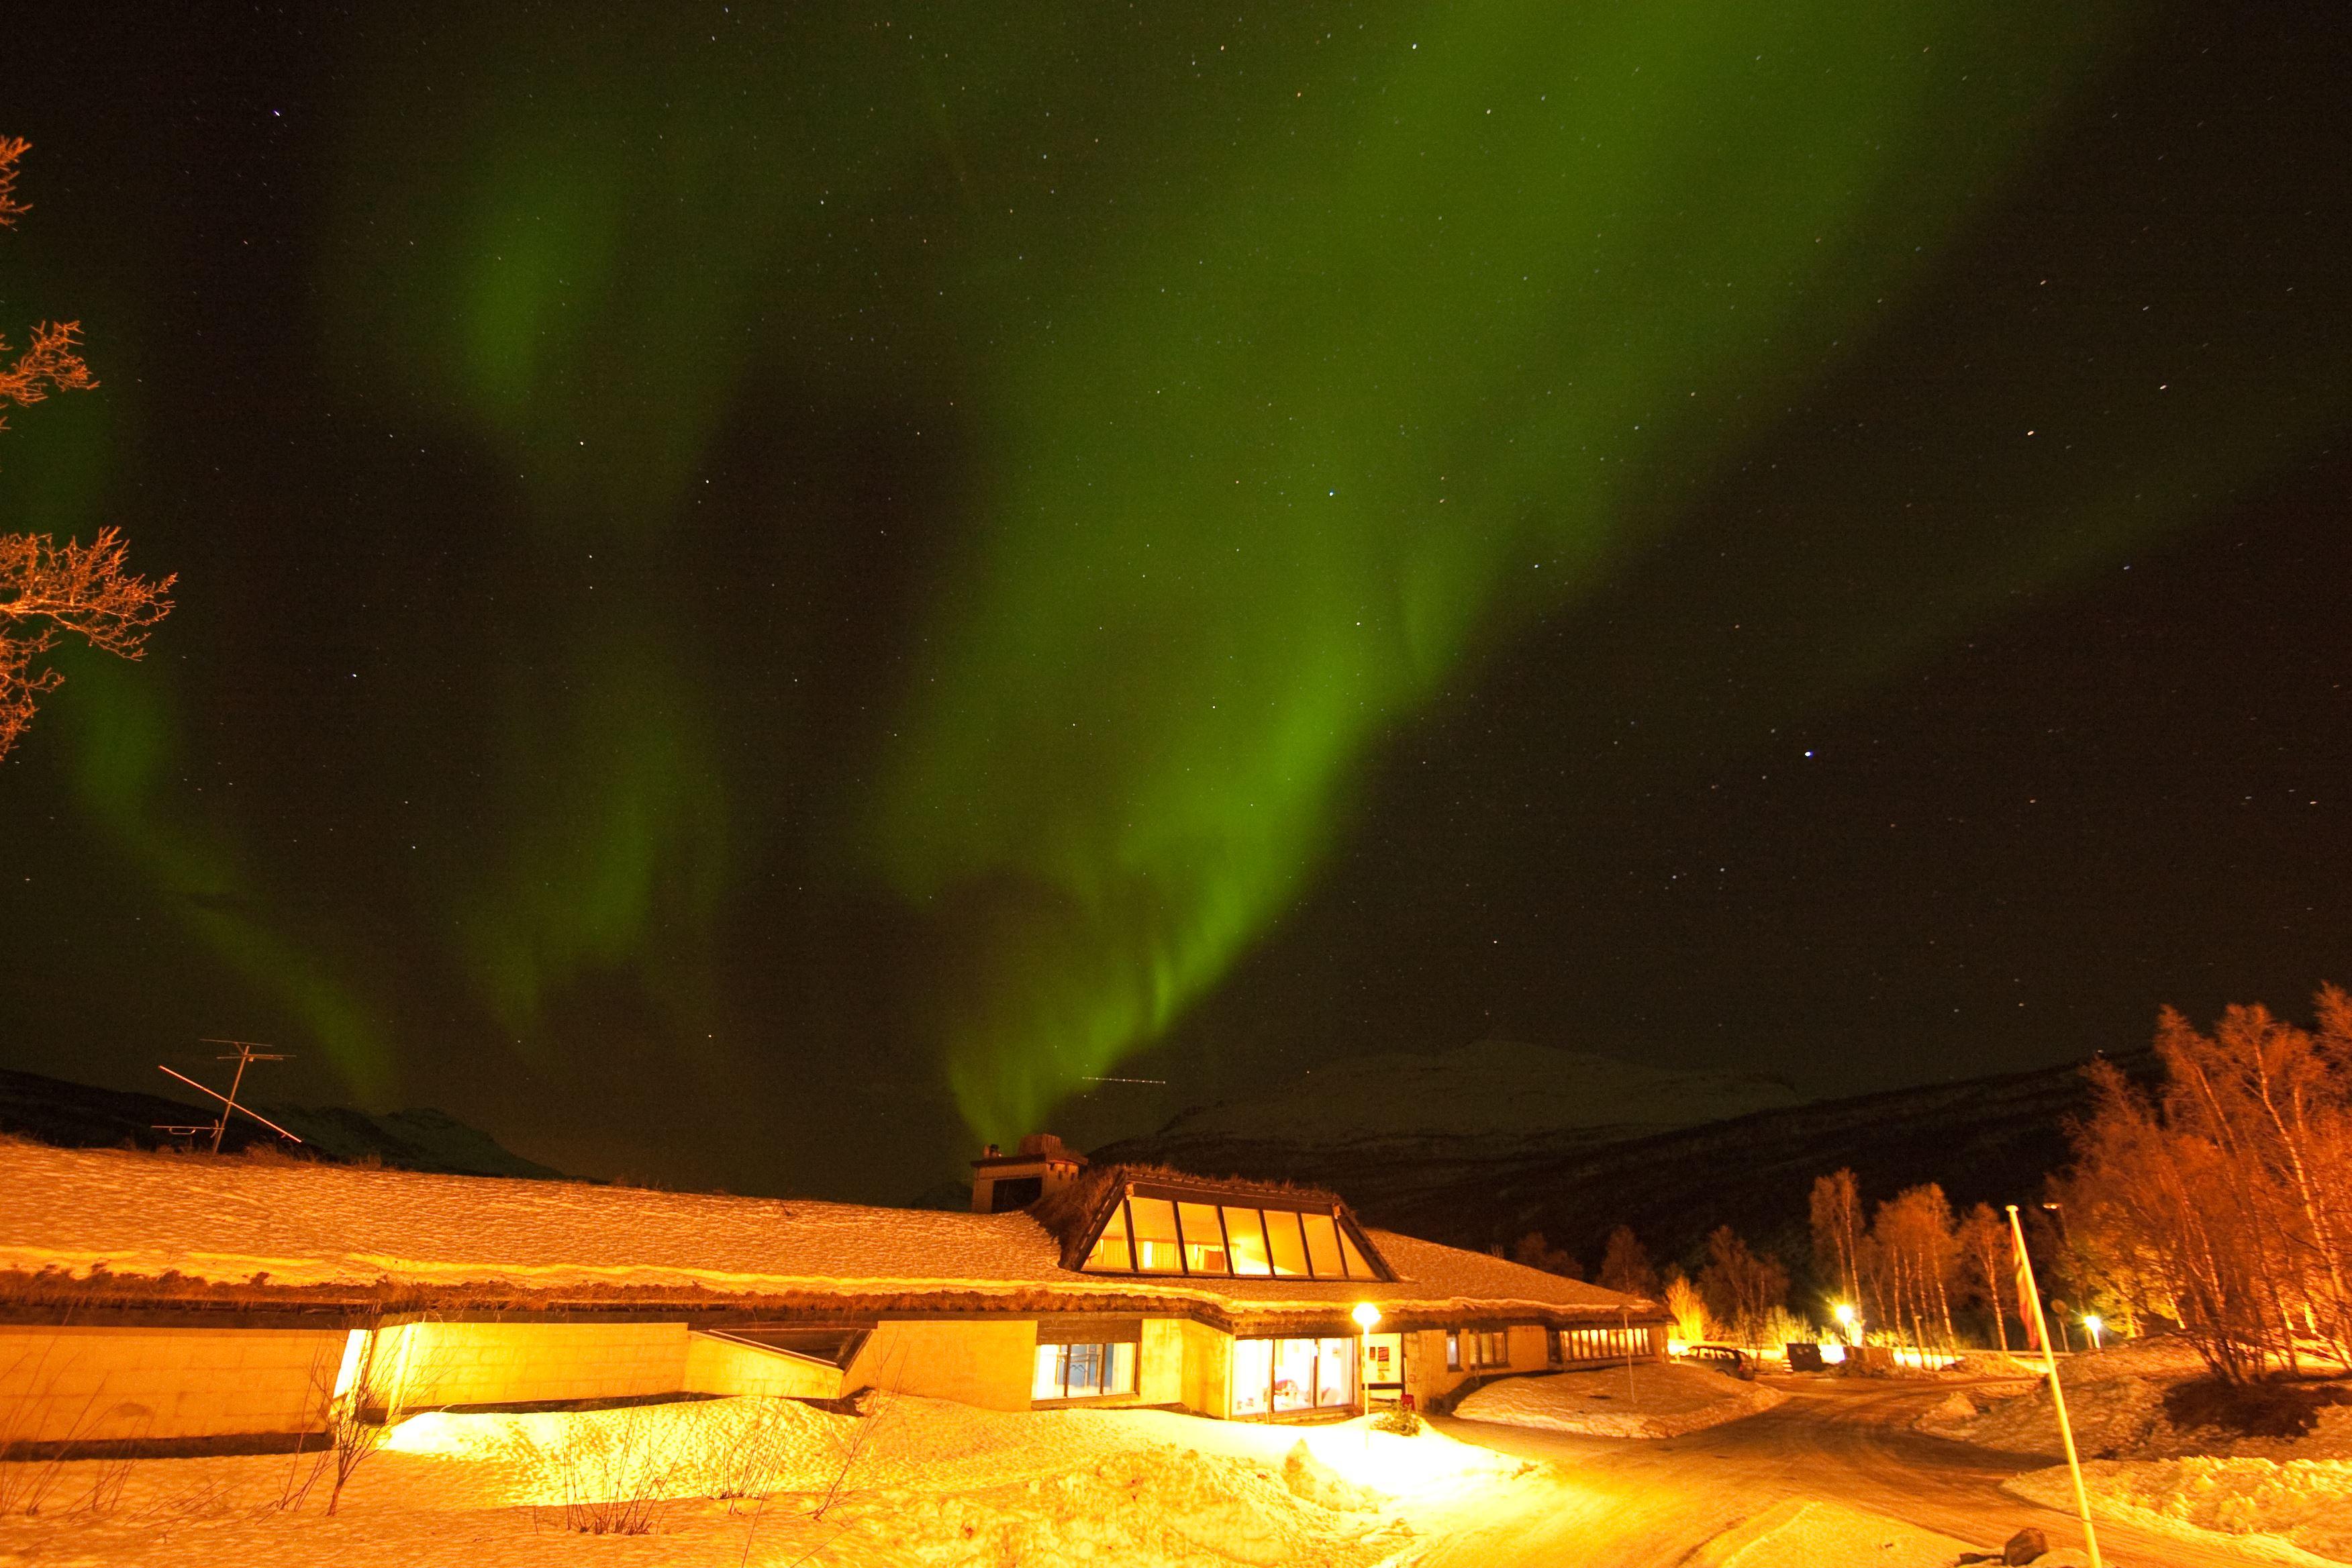 Northern light snowshoe trip with Fjellkysten hotel - Fjellkysten